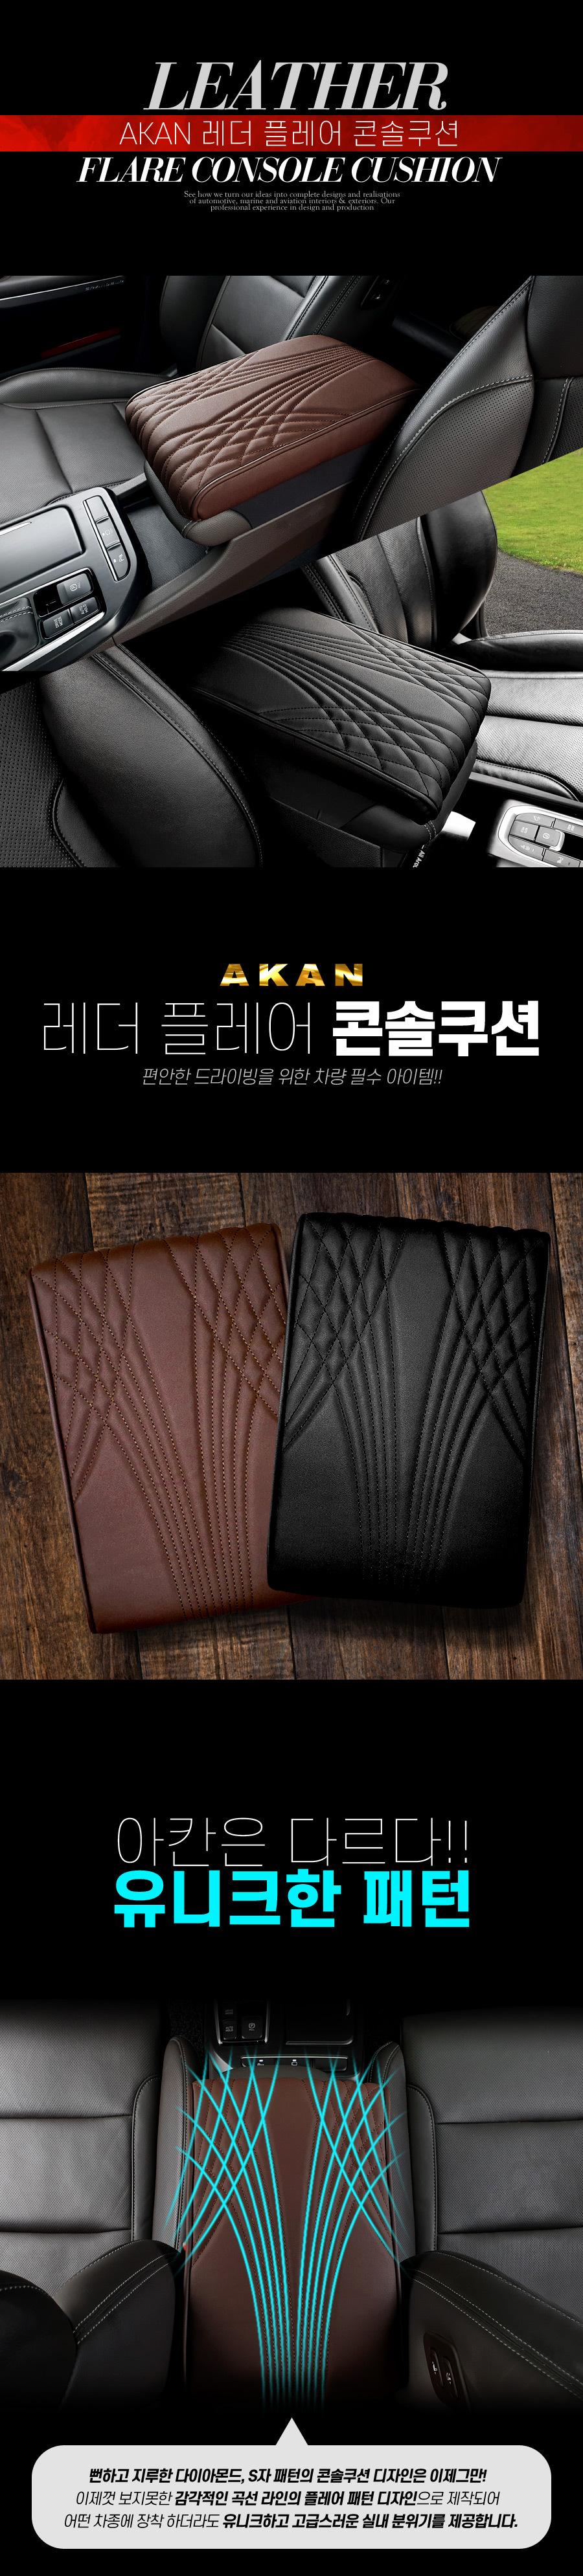 leather-flare-console-cushion_01.jpg